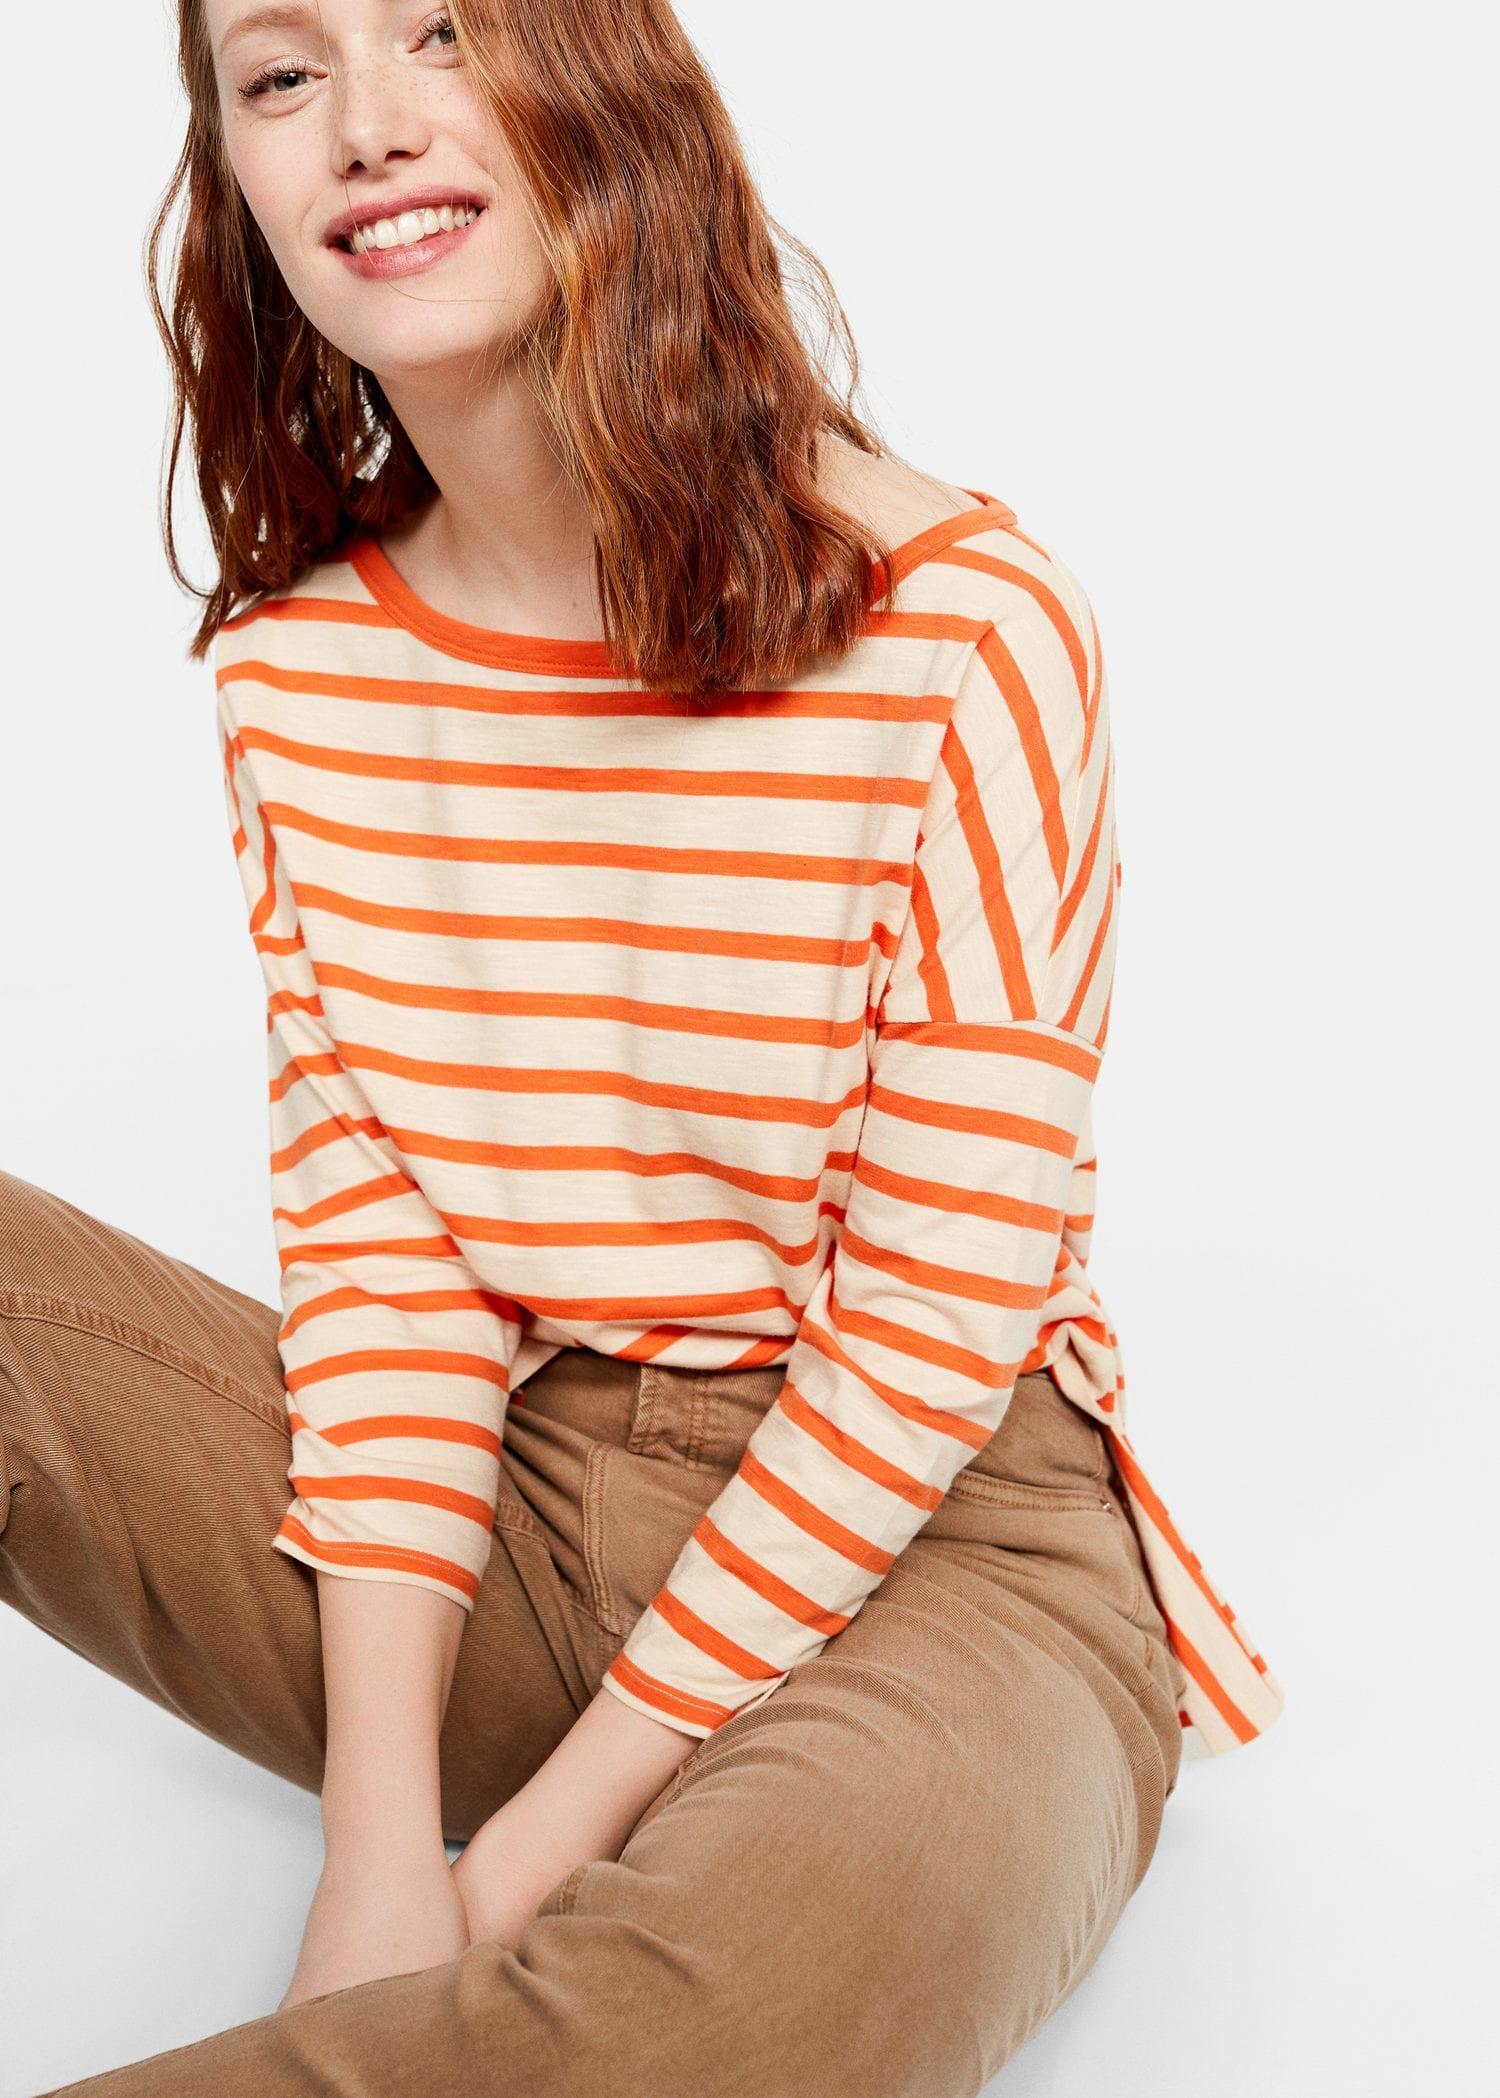 7a1d5cb67b4 Lyst - Violeta by Mango Stripes Organic Cotton T-shirt in Orange